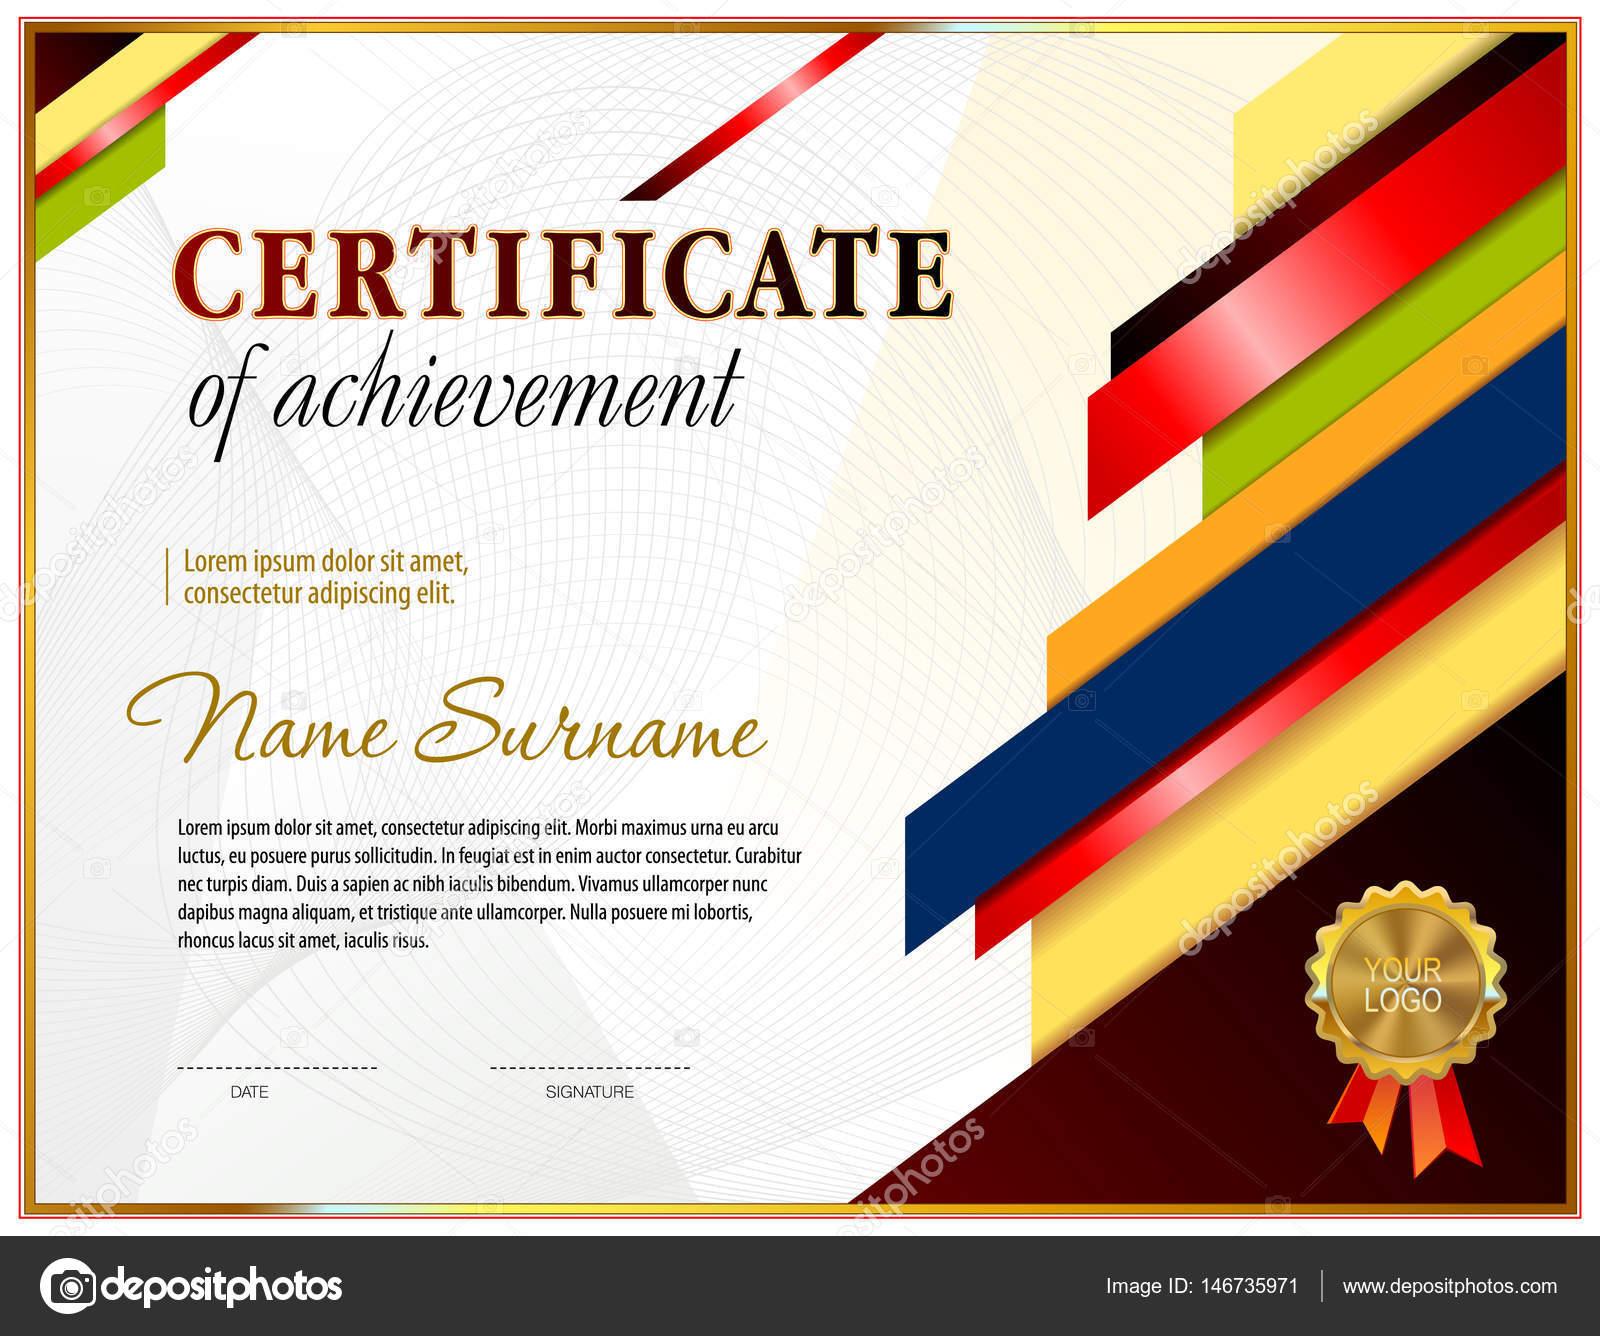 Zertifikat leere Vorlage — Stockvektor © tedgun #146735971